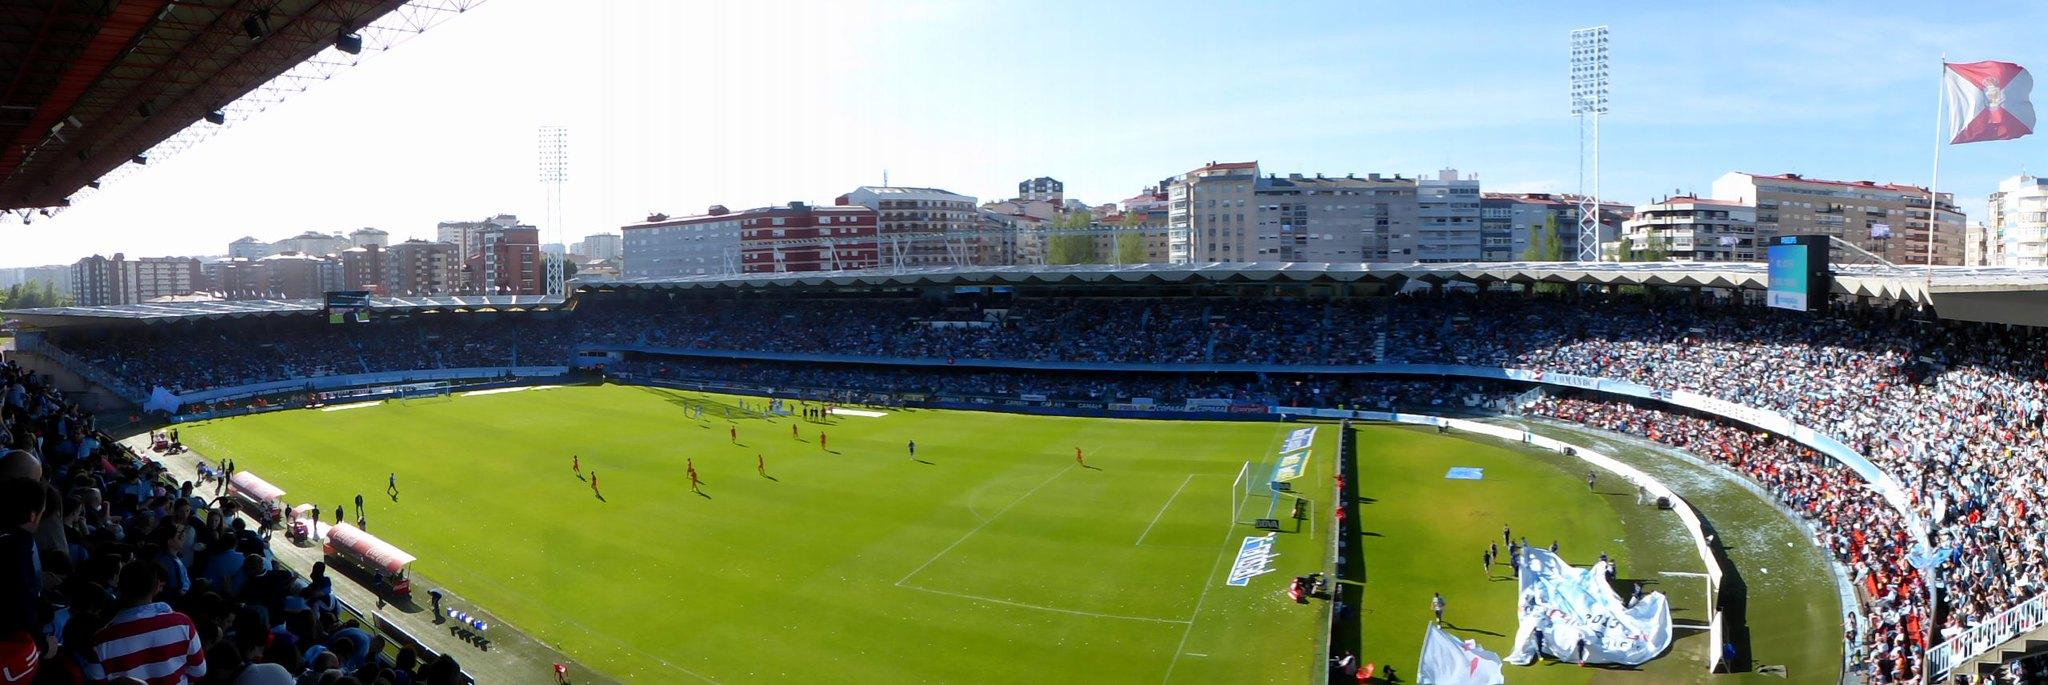 Balaídos lleno, Celta- R.Madrid